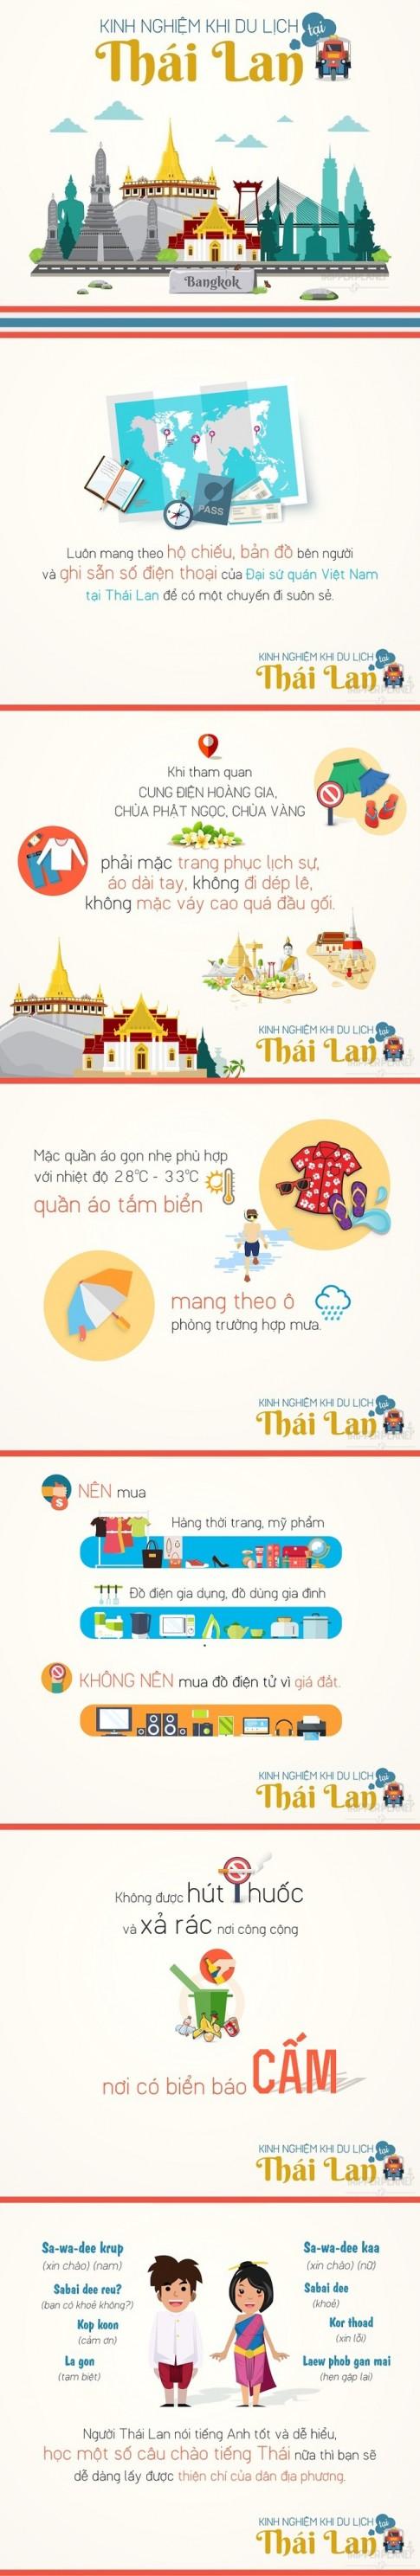 Kinh nghiem bo tui khi du lich Thai Lan